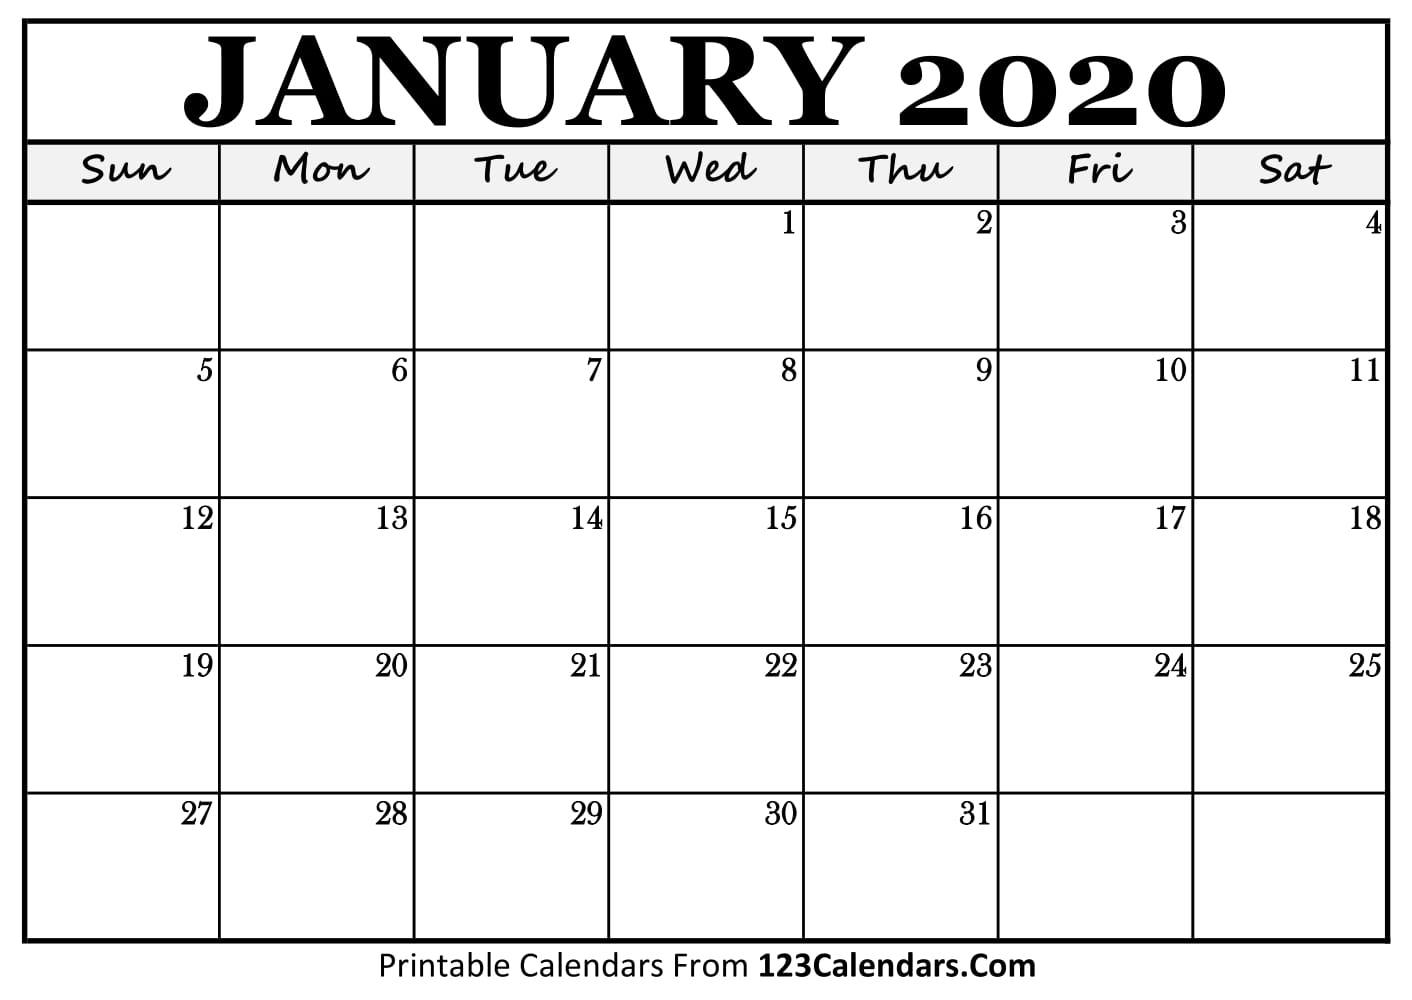 January 2020 Printable Calendar   123Calendars with regard to Large Blank Monthly Calendars January Printable